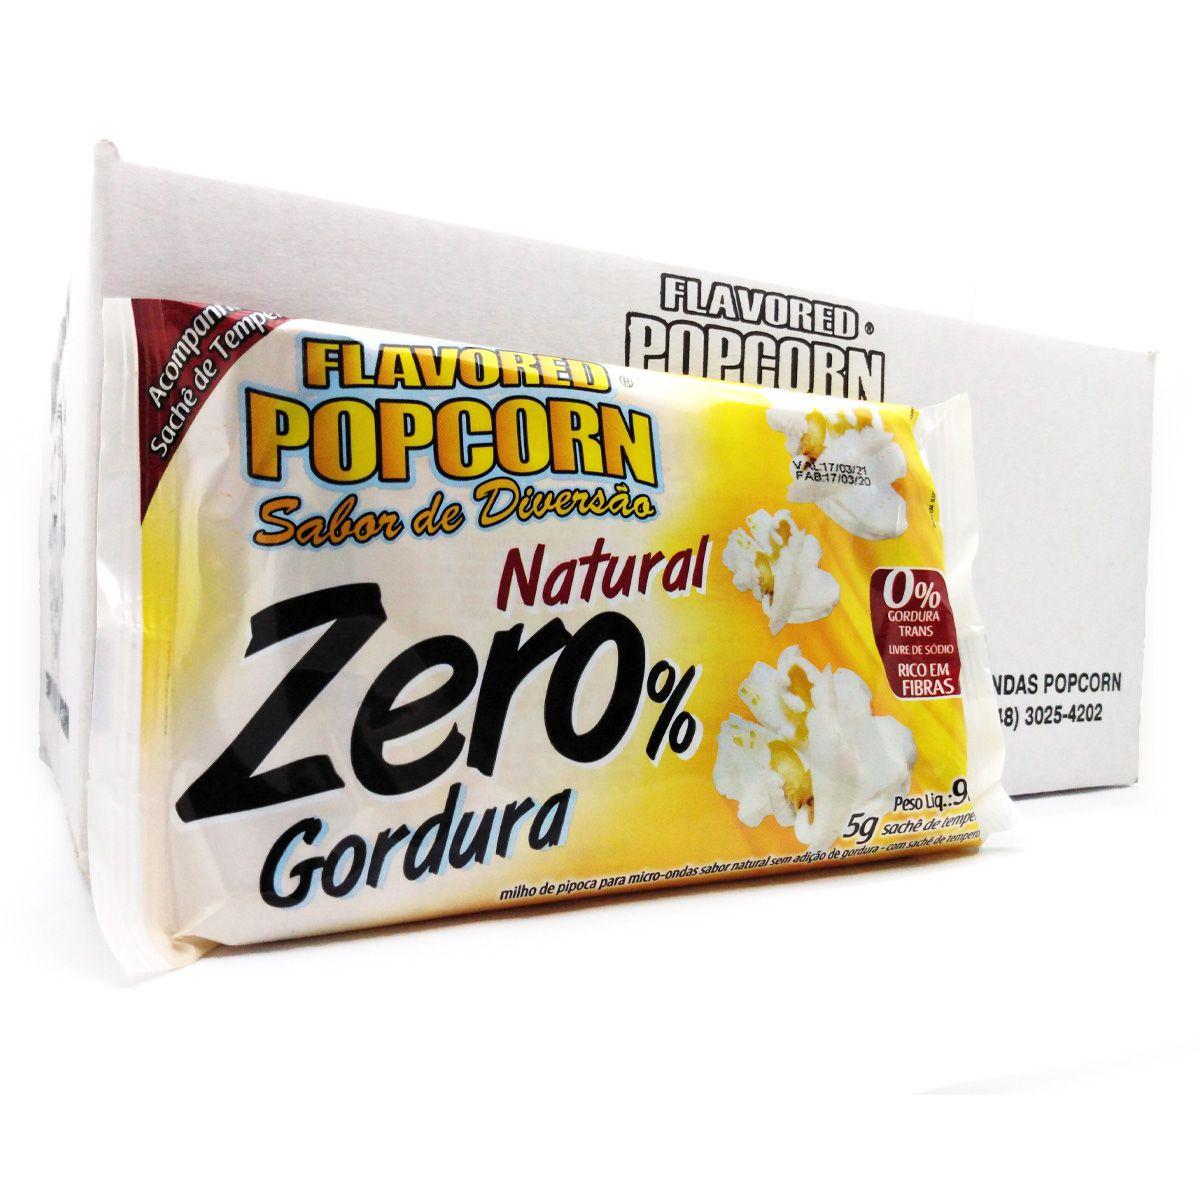 Pipoca Microondas Zero % gordura c/ sachê de sabor - Caixa 06 1 Bags ou 16 Bags.